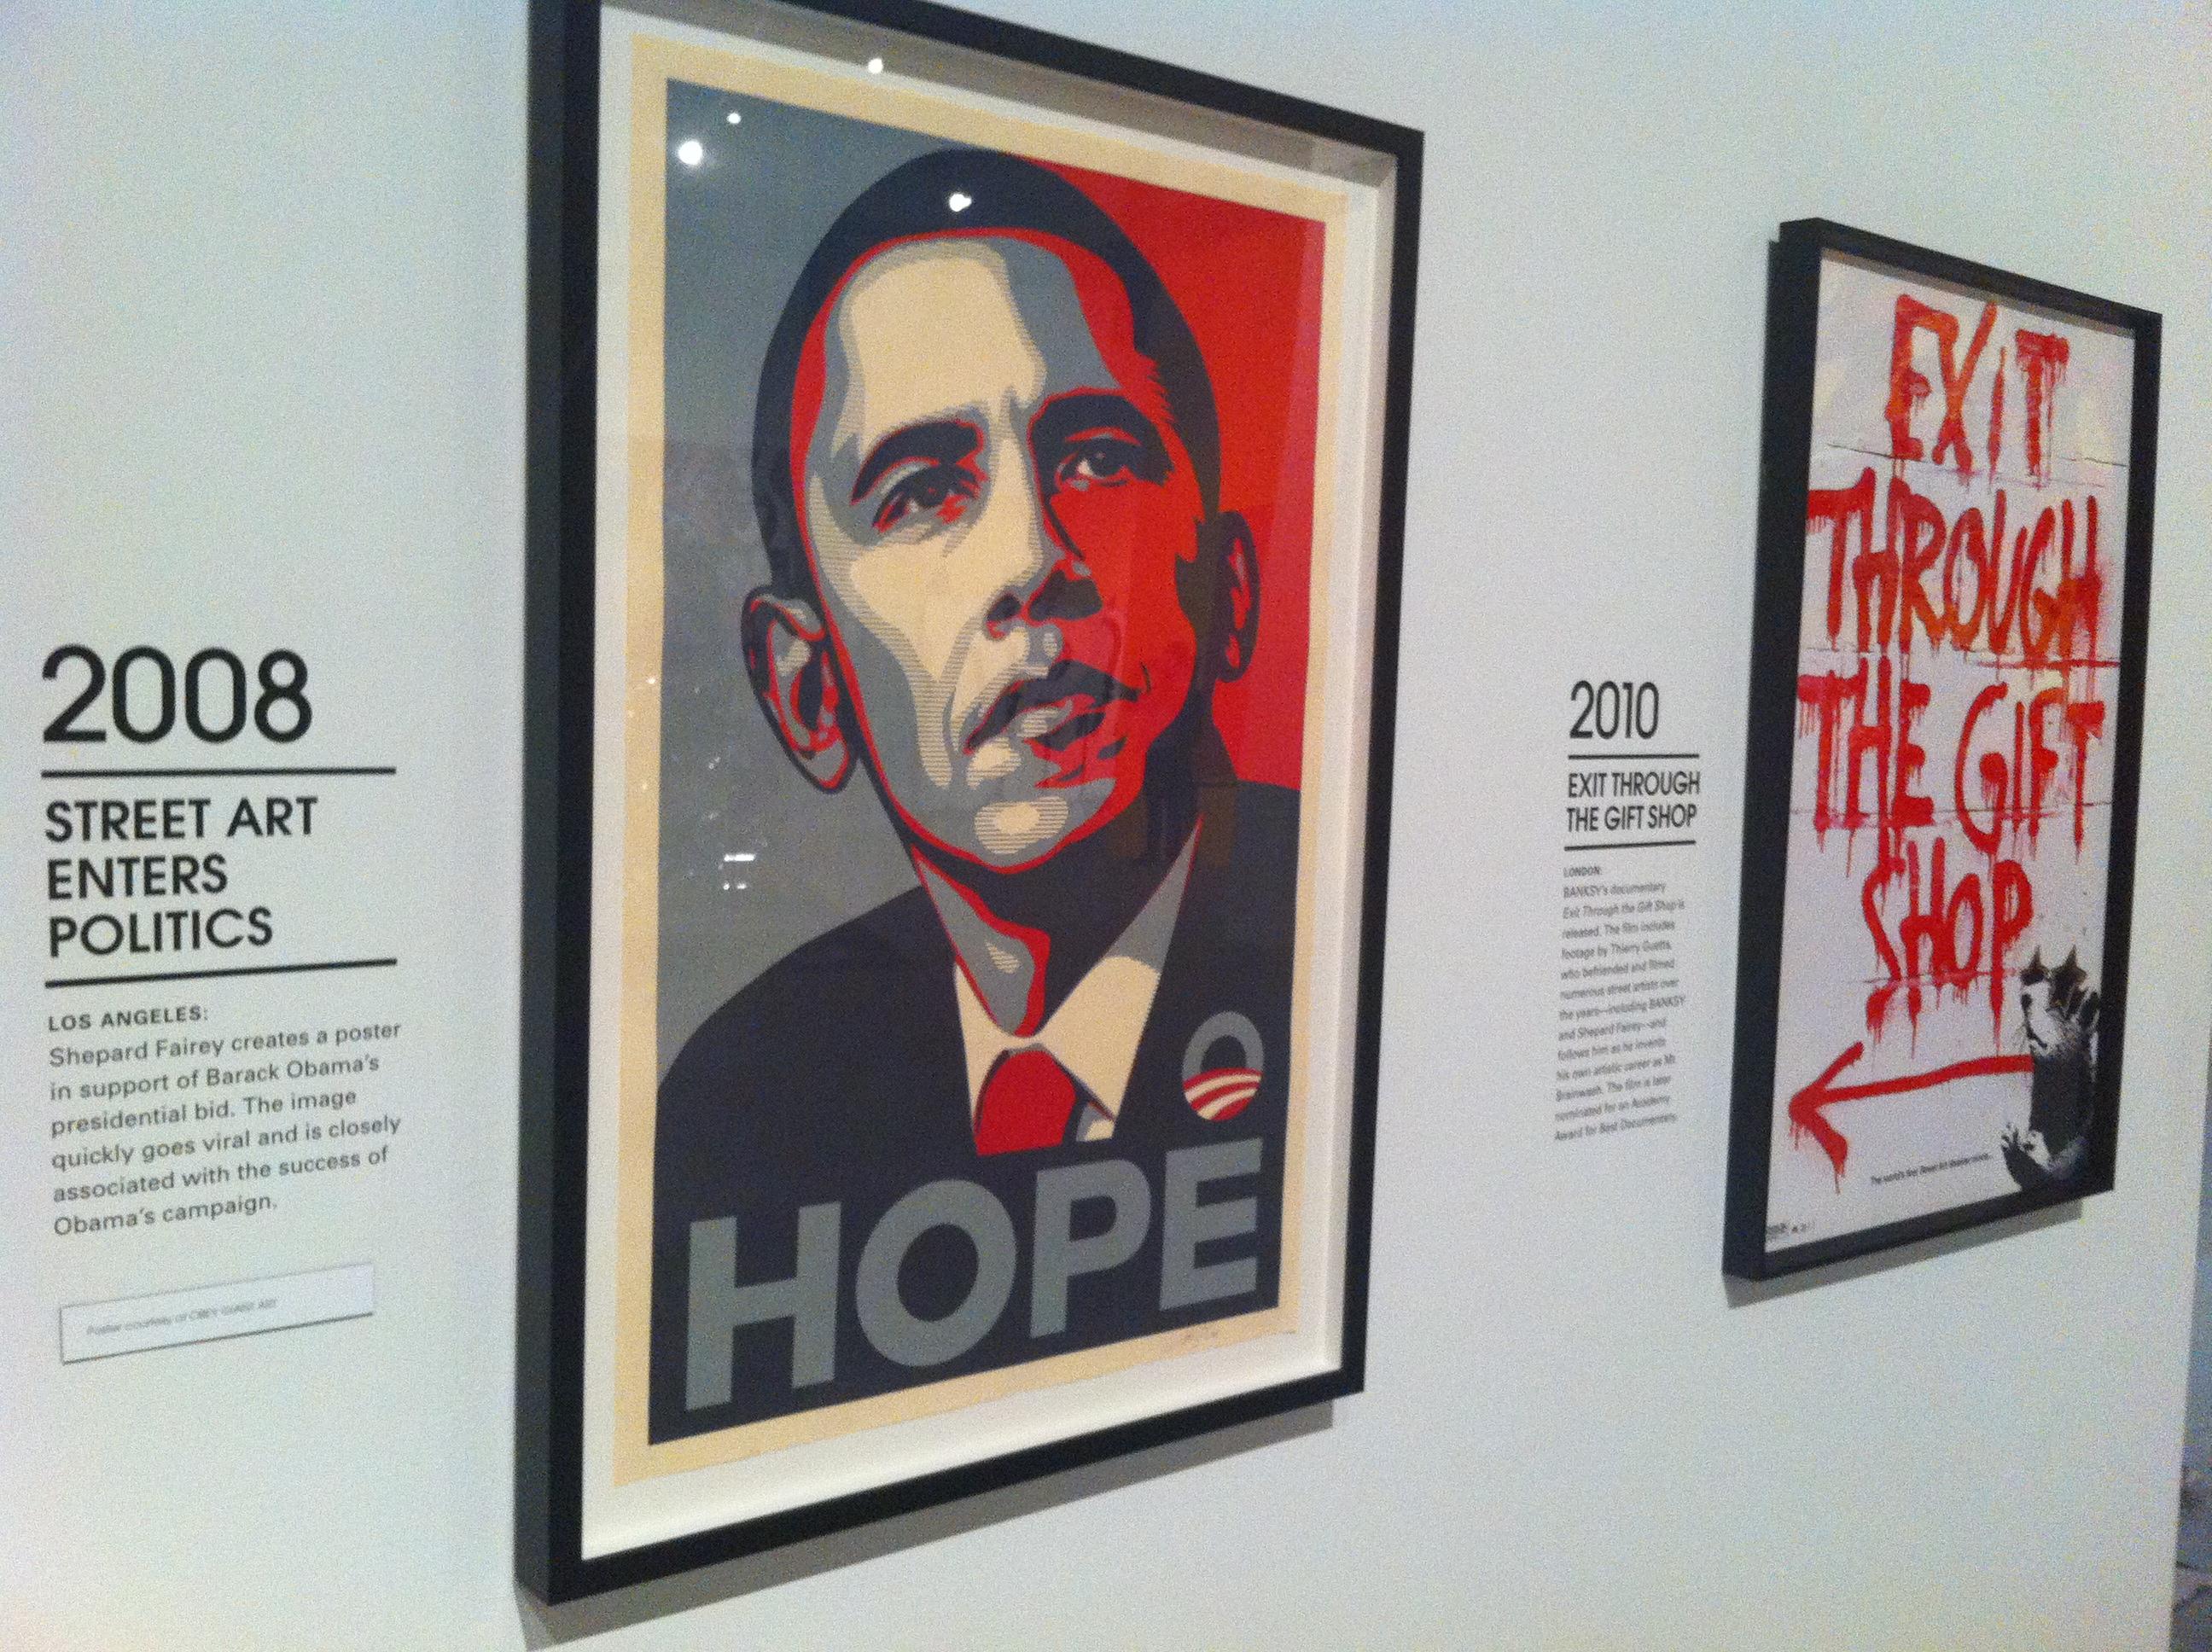 Streetart in Politics / Streetart in Film